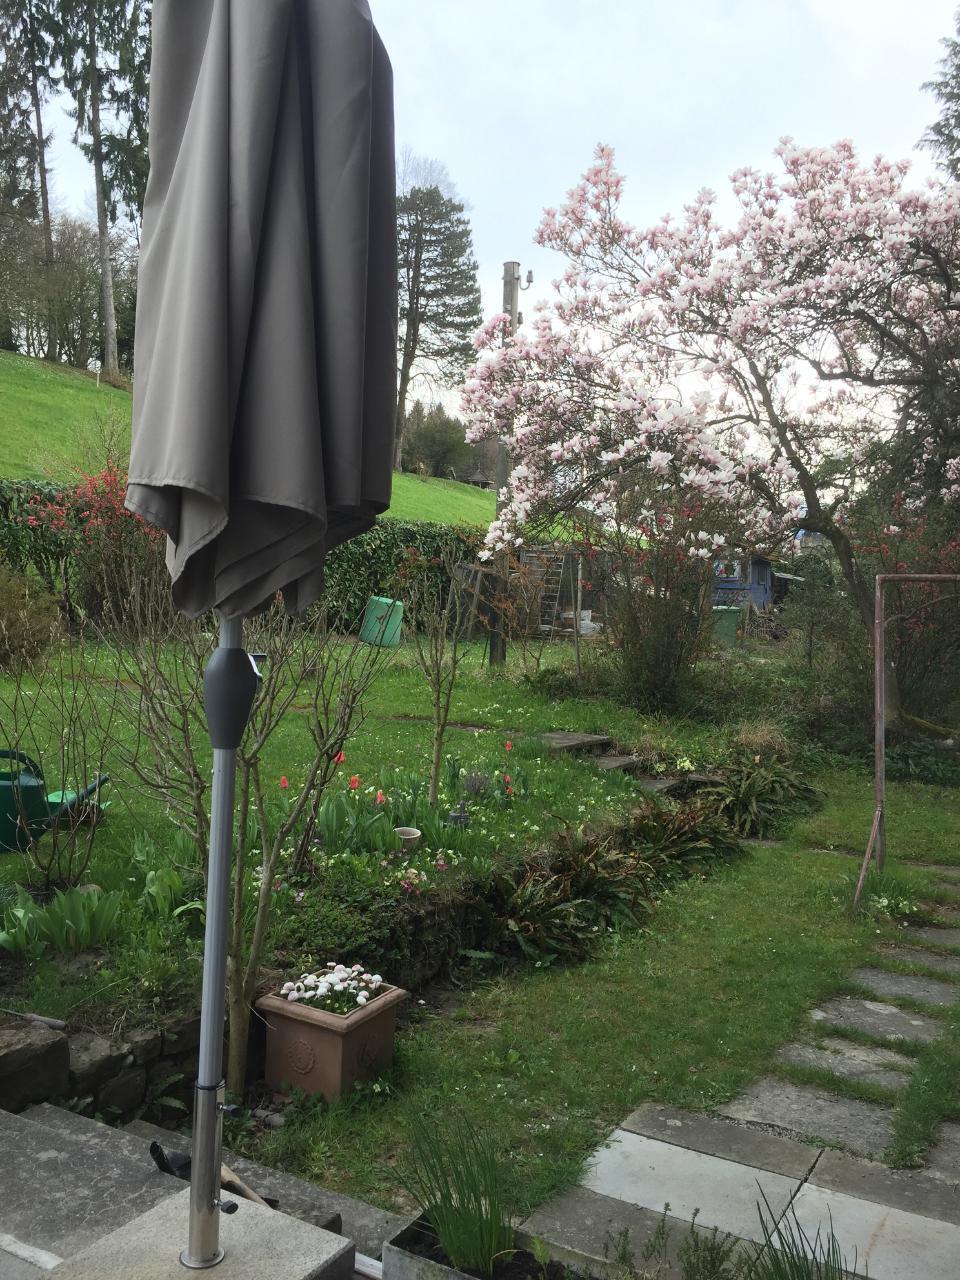 Small, beautiful Garden-apartment near Lucerne